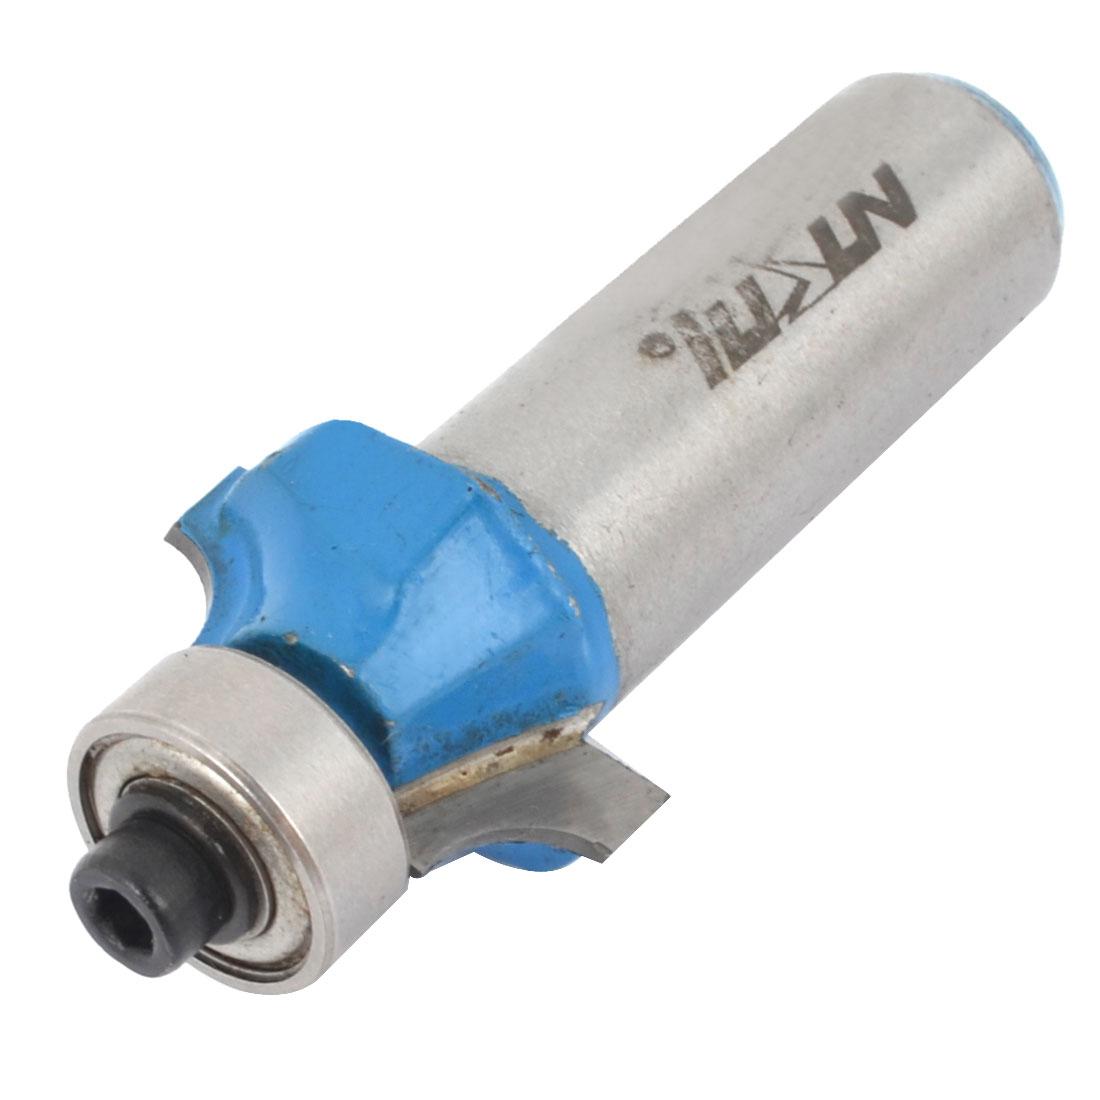 "1/2"" Shank 3/16"" Radius Two Flutes Metal Roundover Router Bit Bearing Cutter"